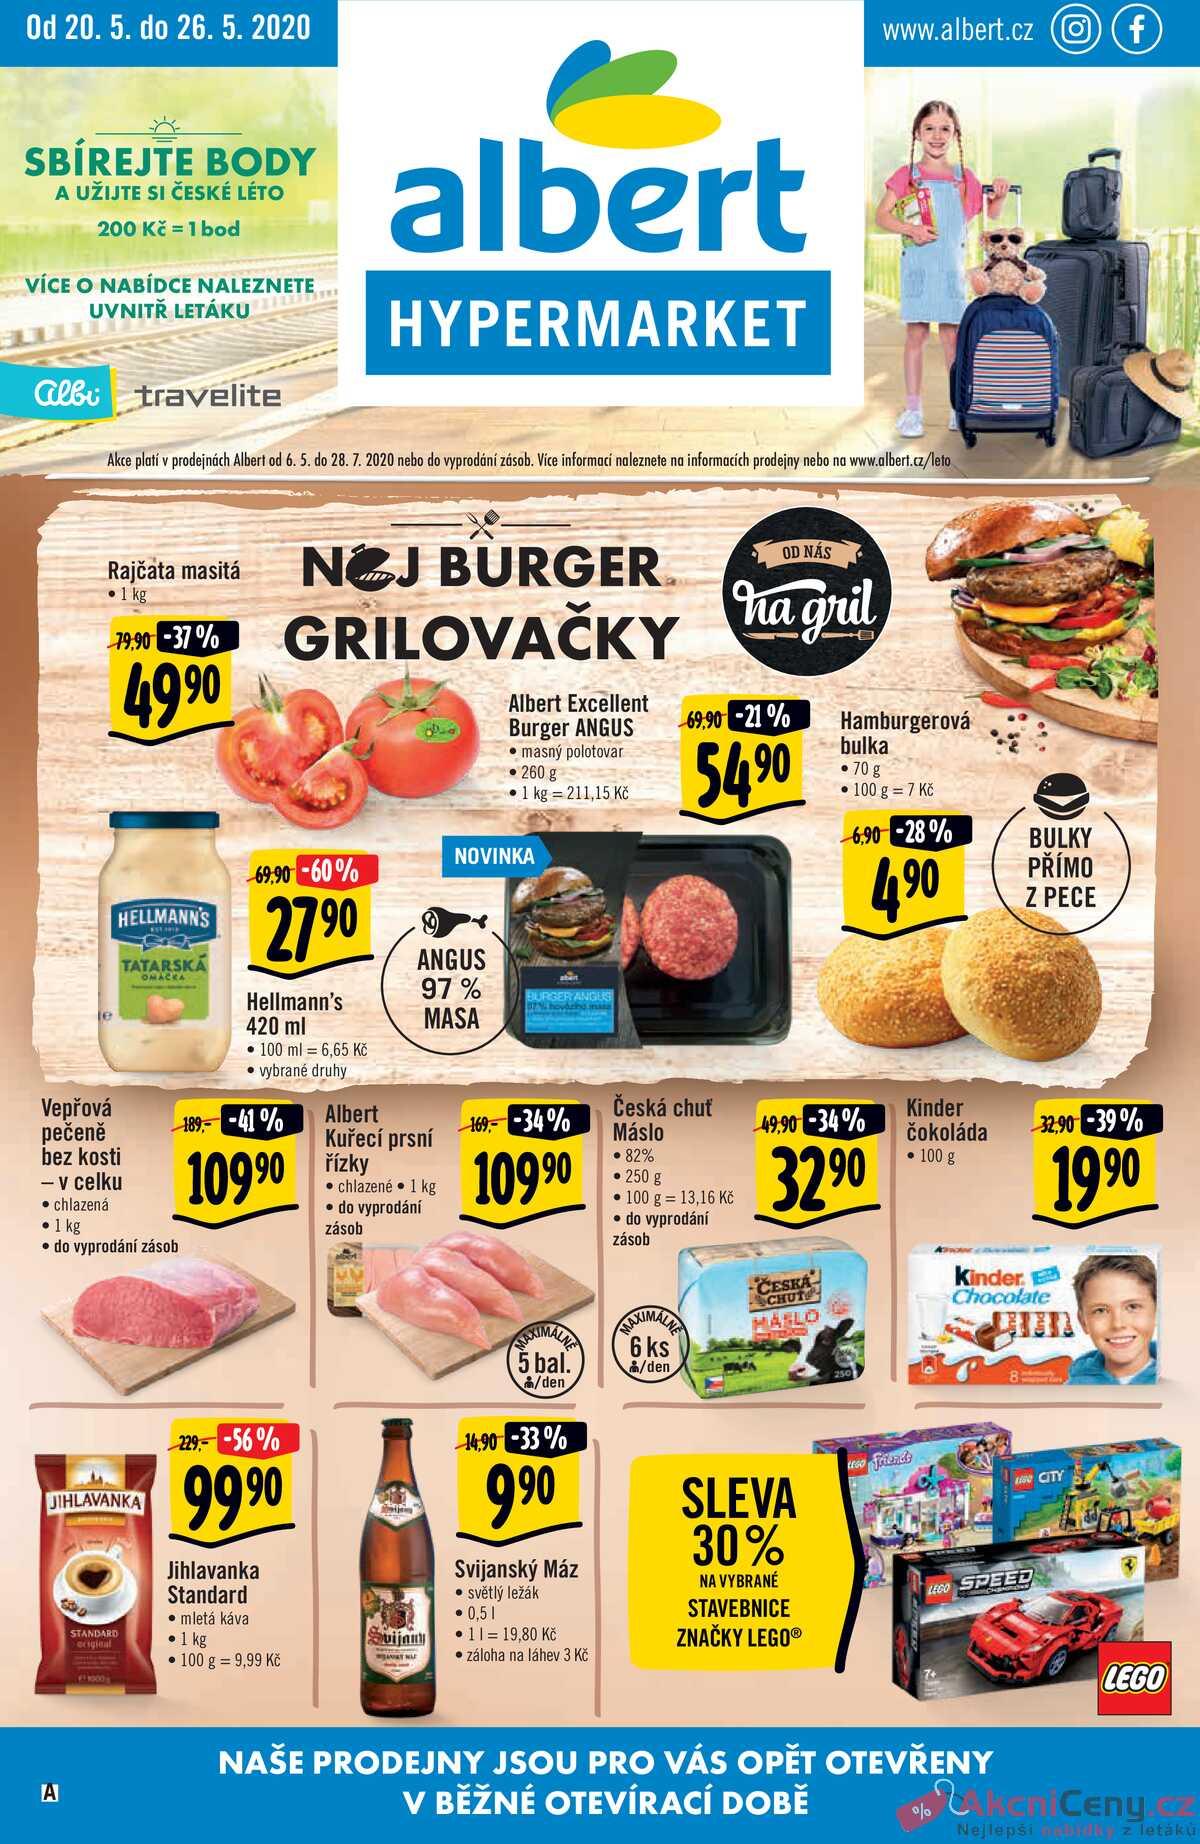 Leták Albert Hypermarket strana 1/24